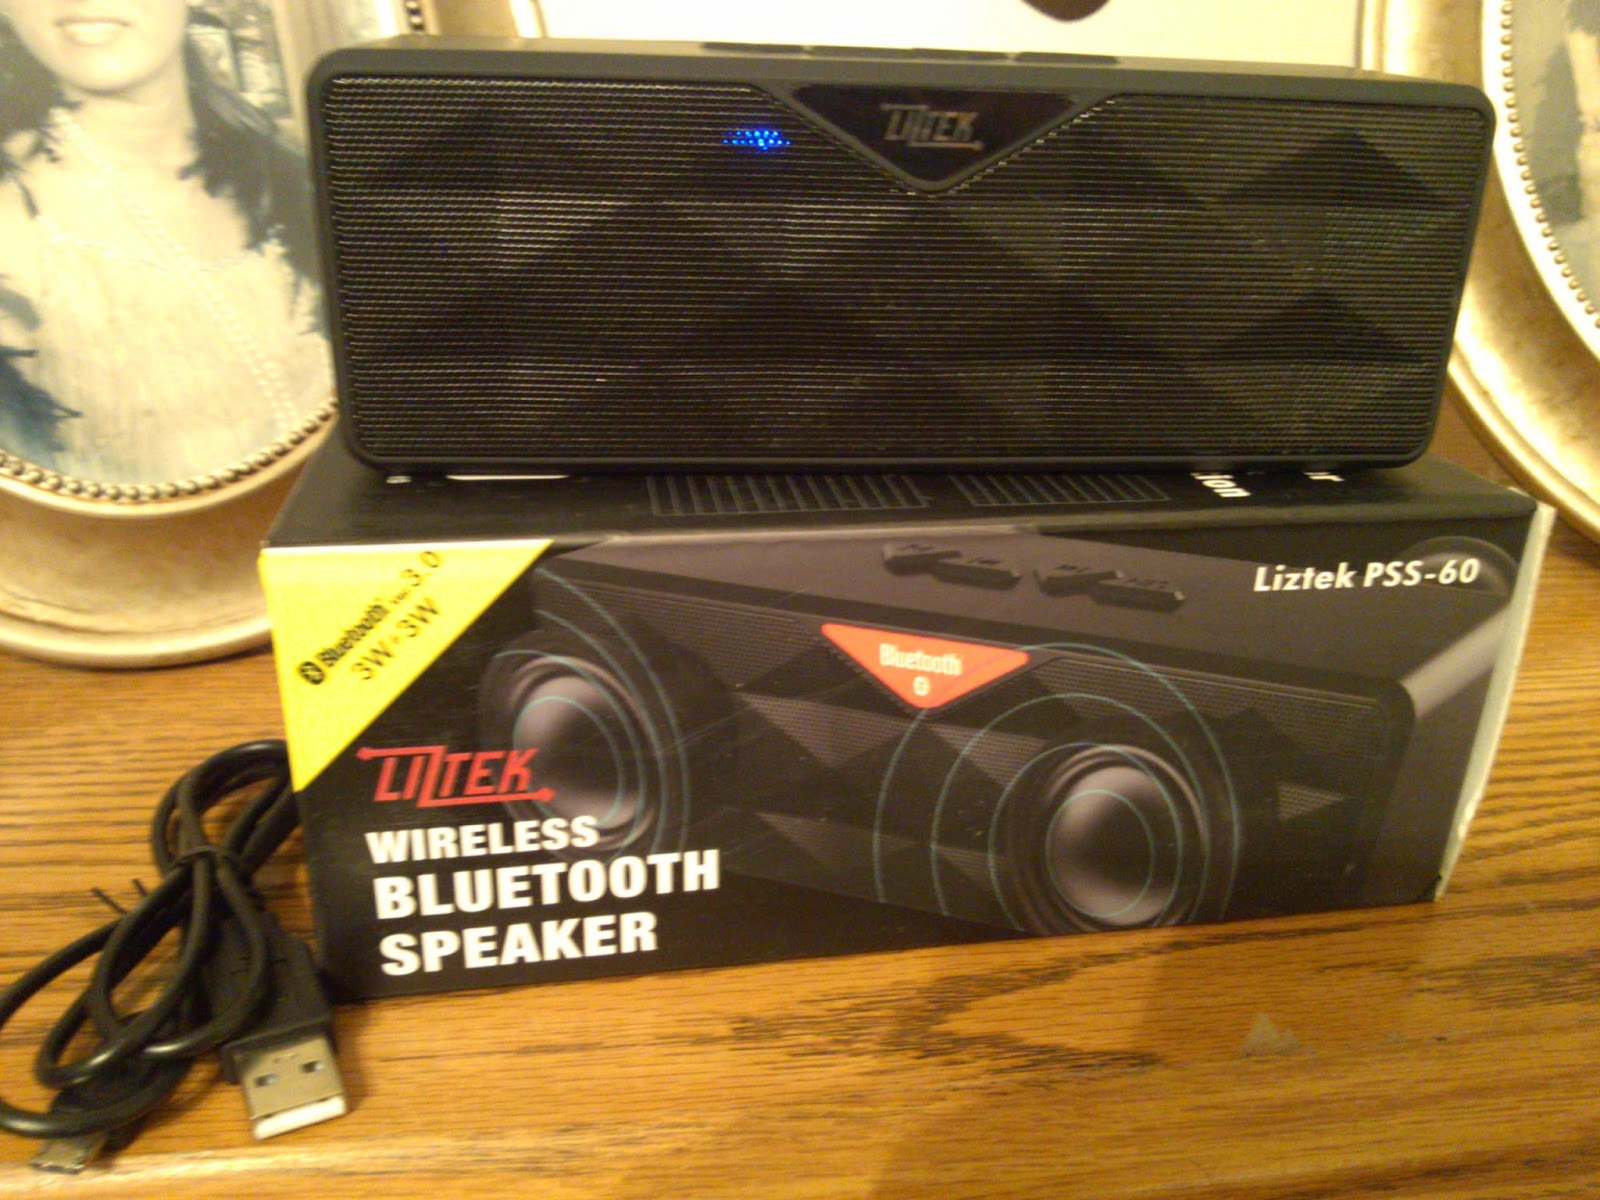 Liztek Ultra-Portable Wireless Bluetooth Speaker Review